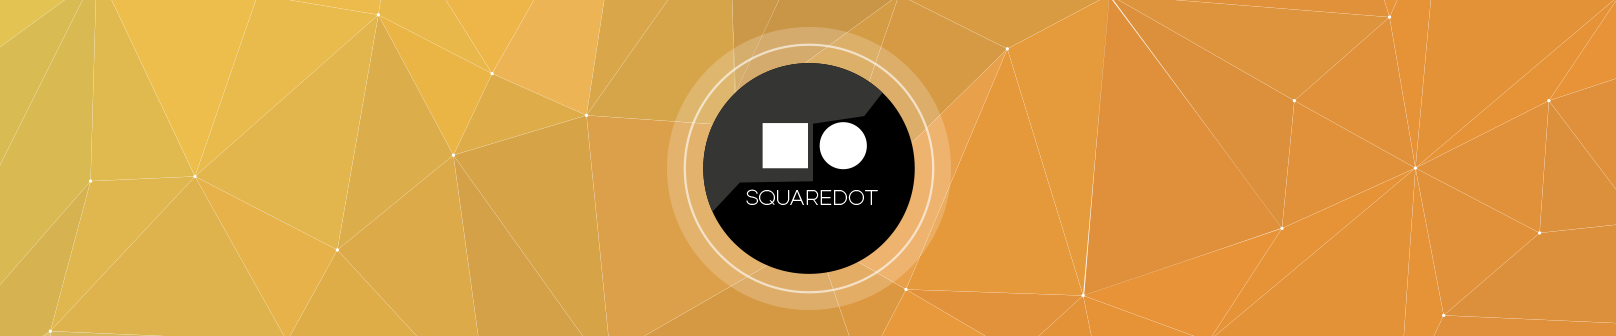 Squaredot B2B Content Marketing